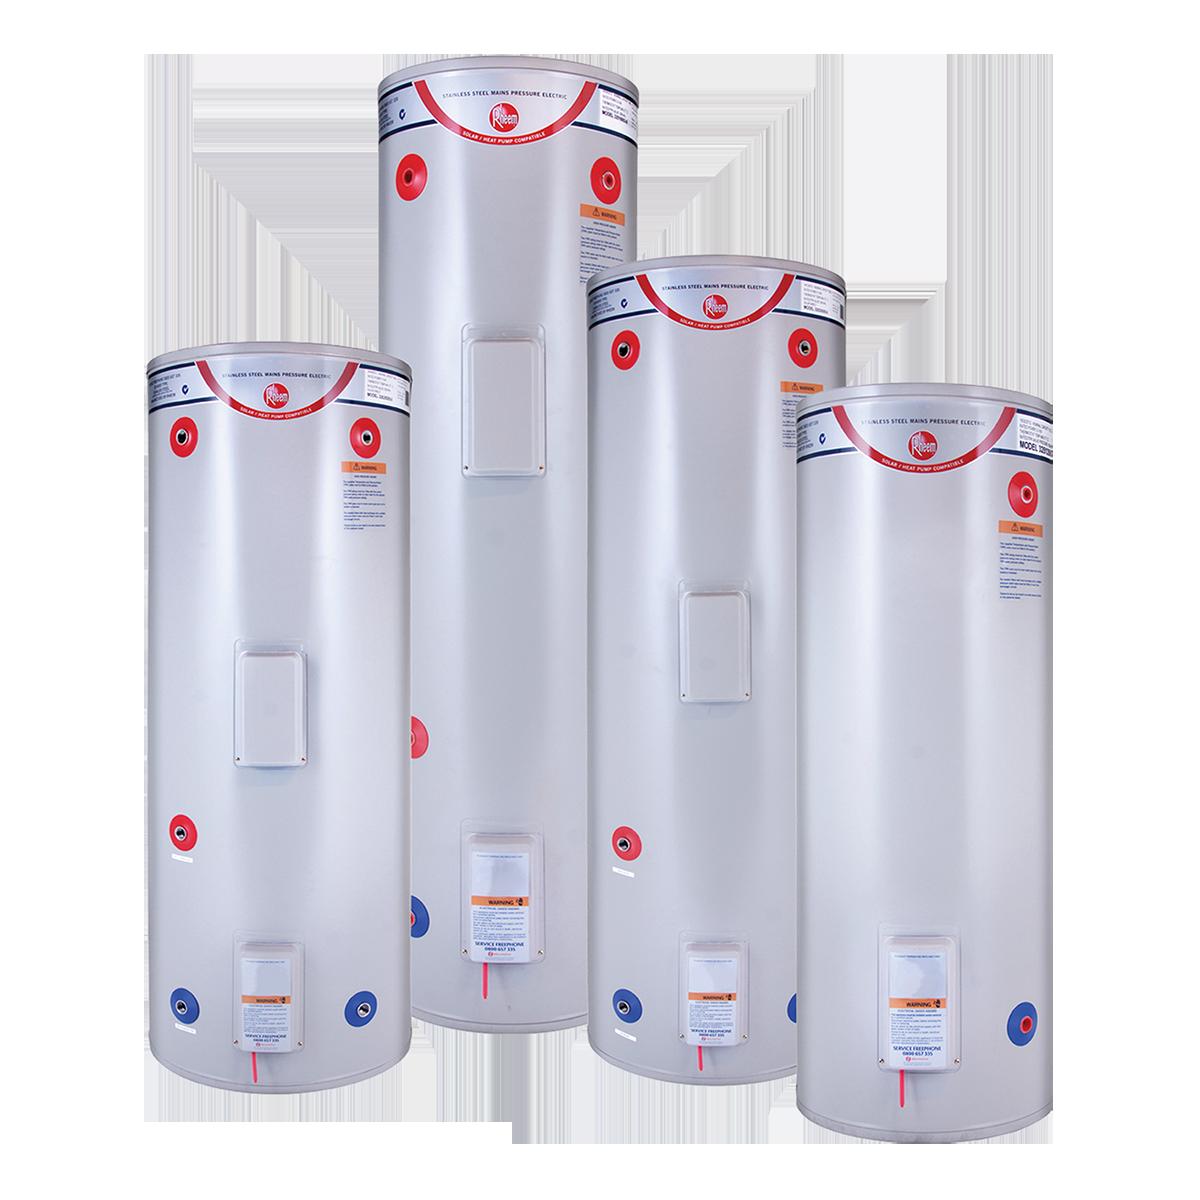 Hot Water Cylinders | Plumbing World